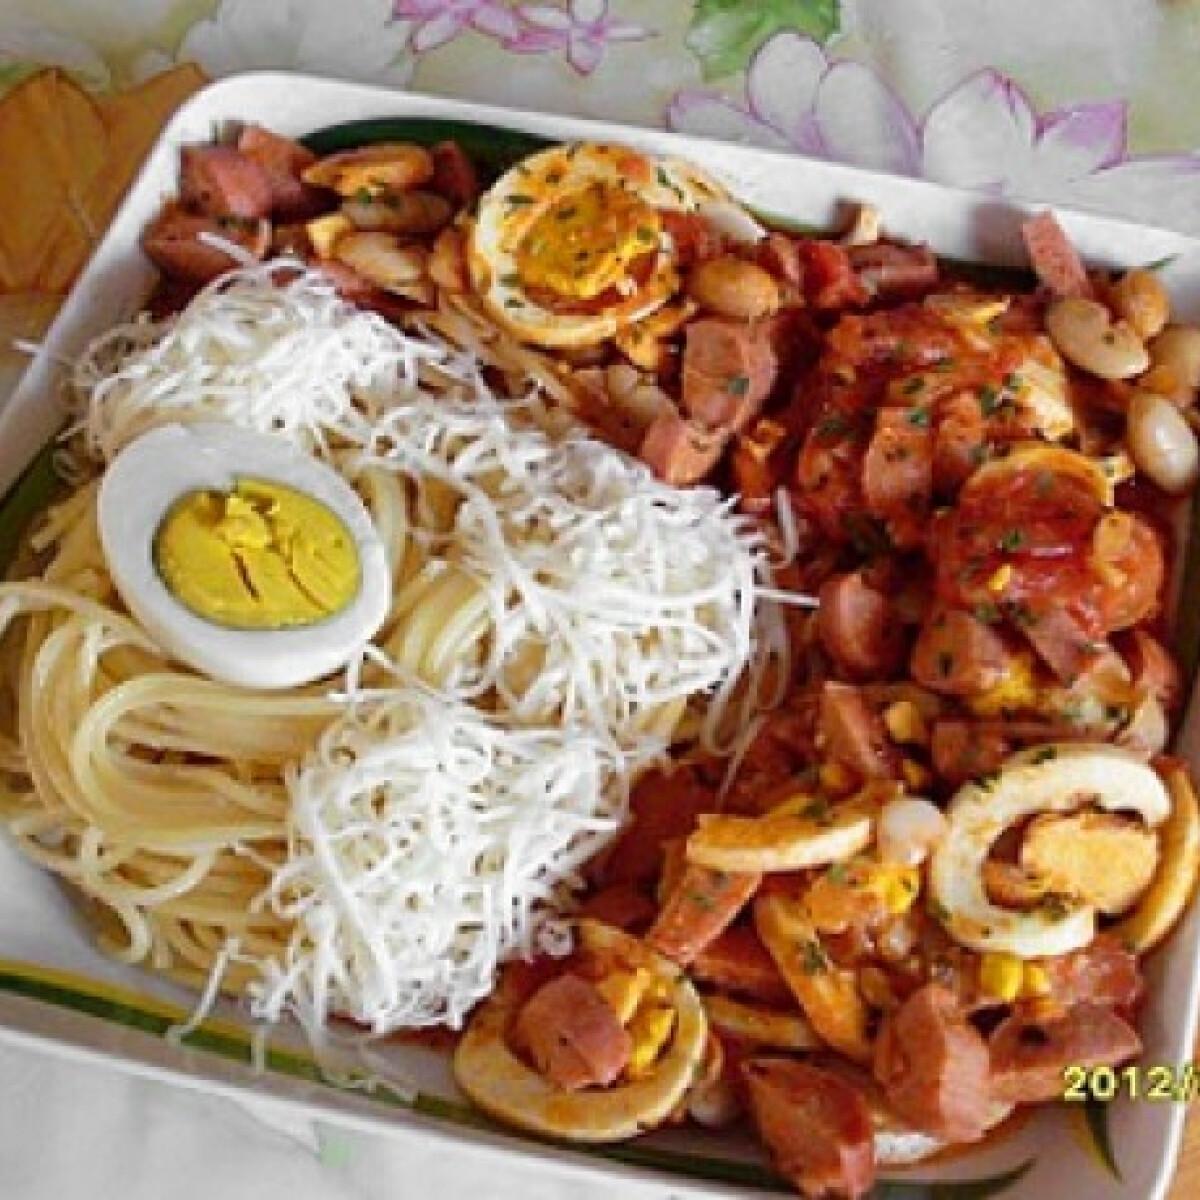 Tojásos-fehérbabos virslipörkölt spagettivel